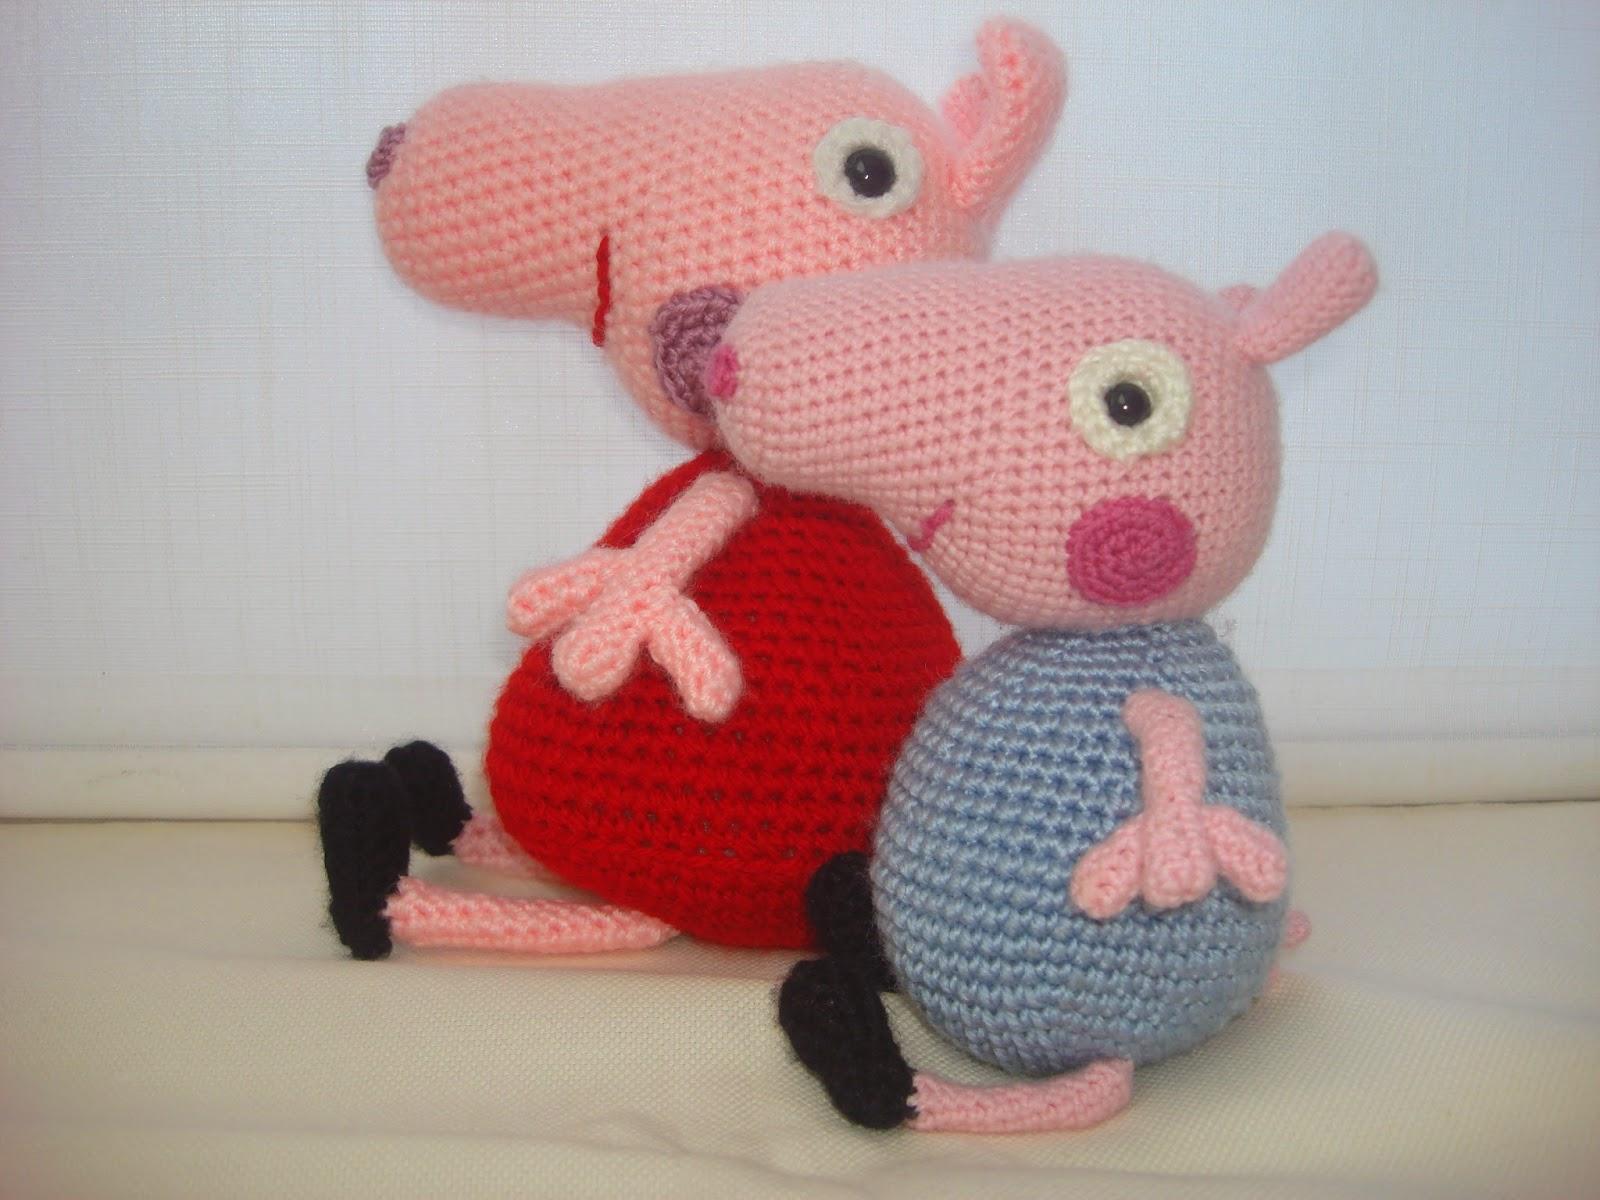 CANAL CROCHET: Amigurumi George Pig